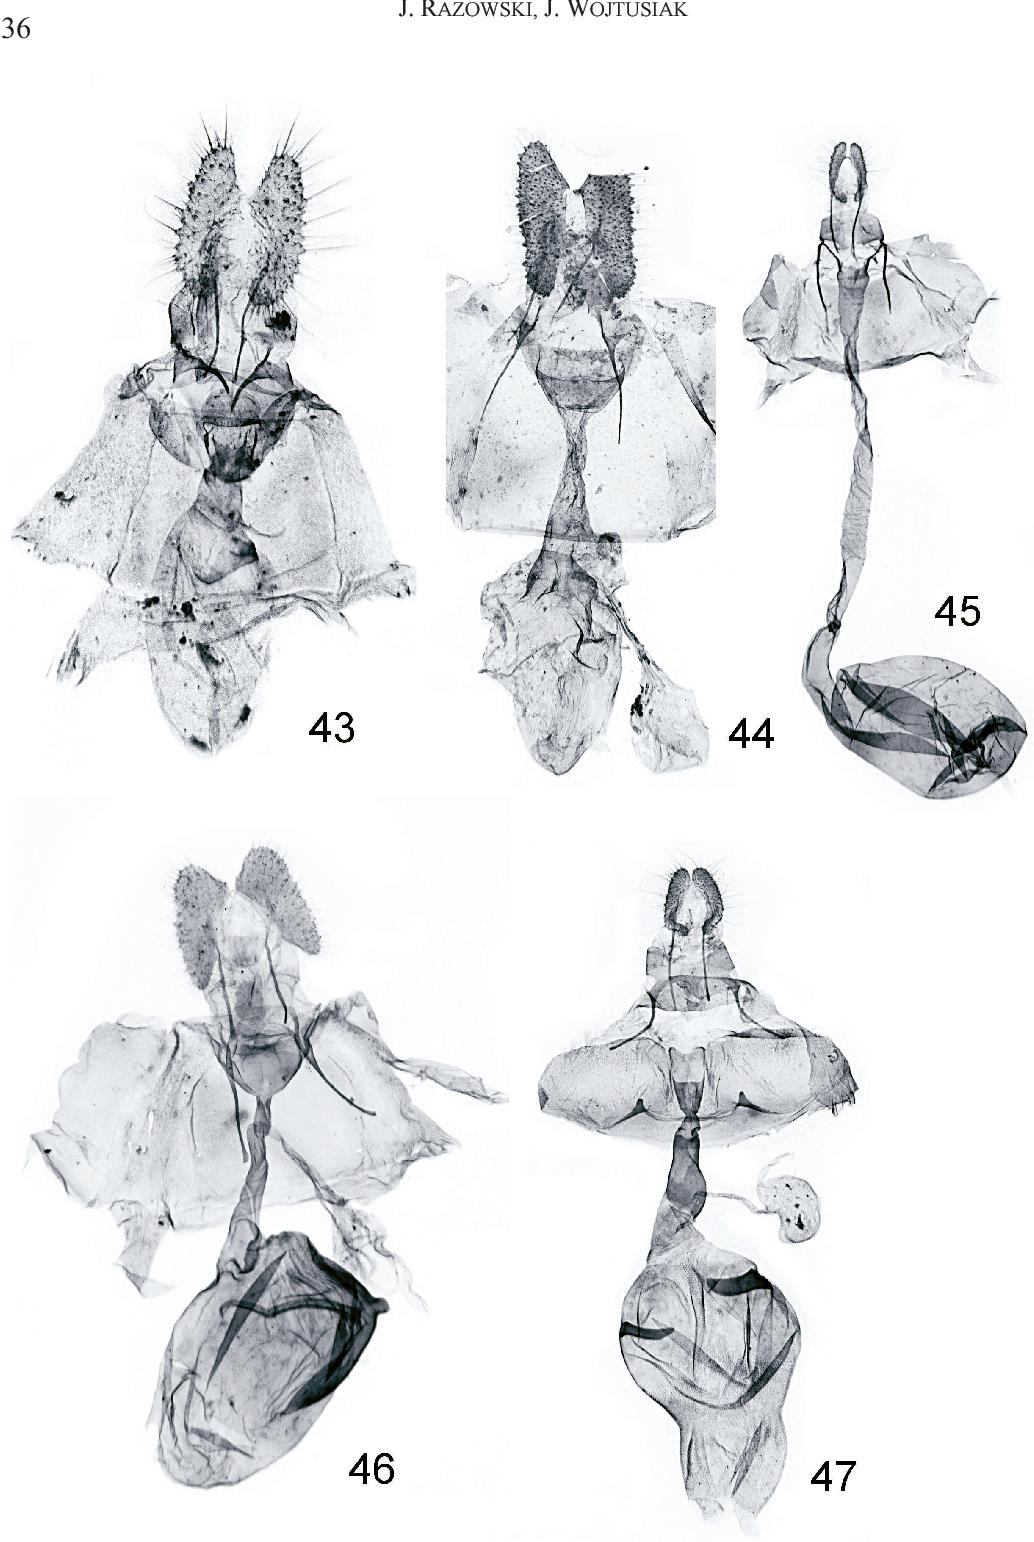 figure 43-47